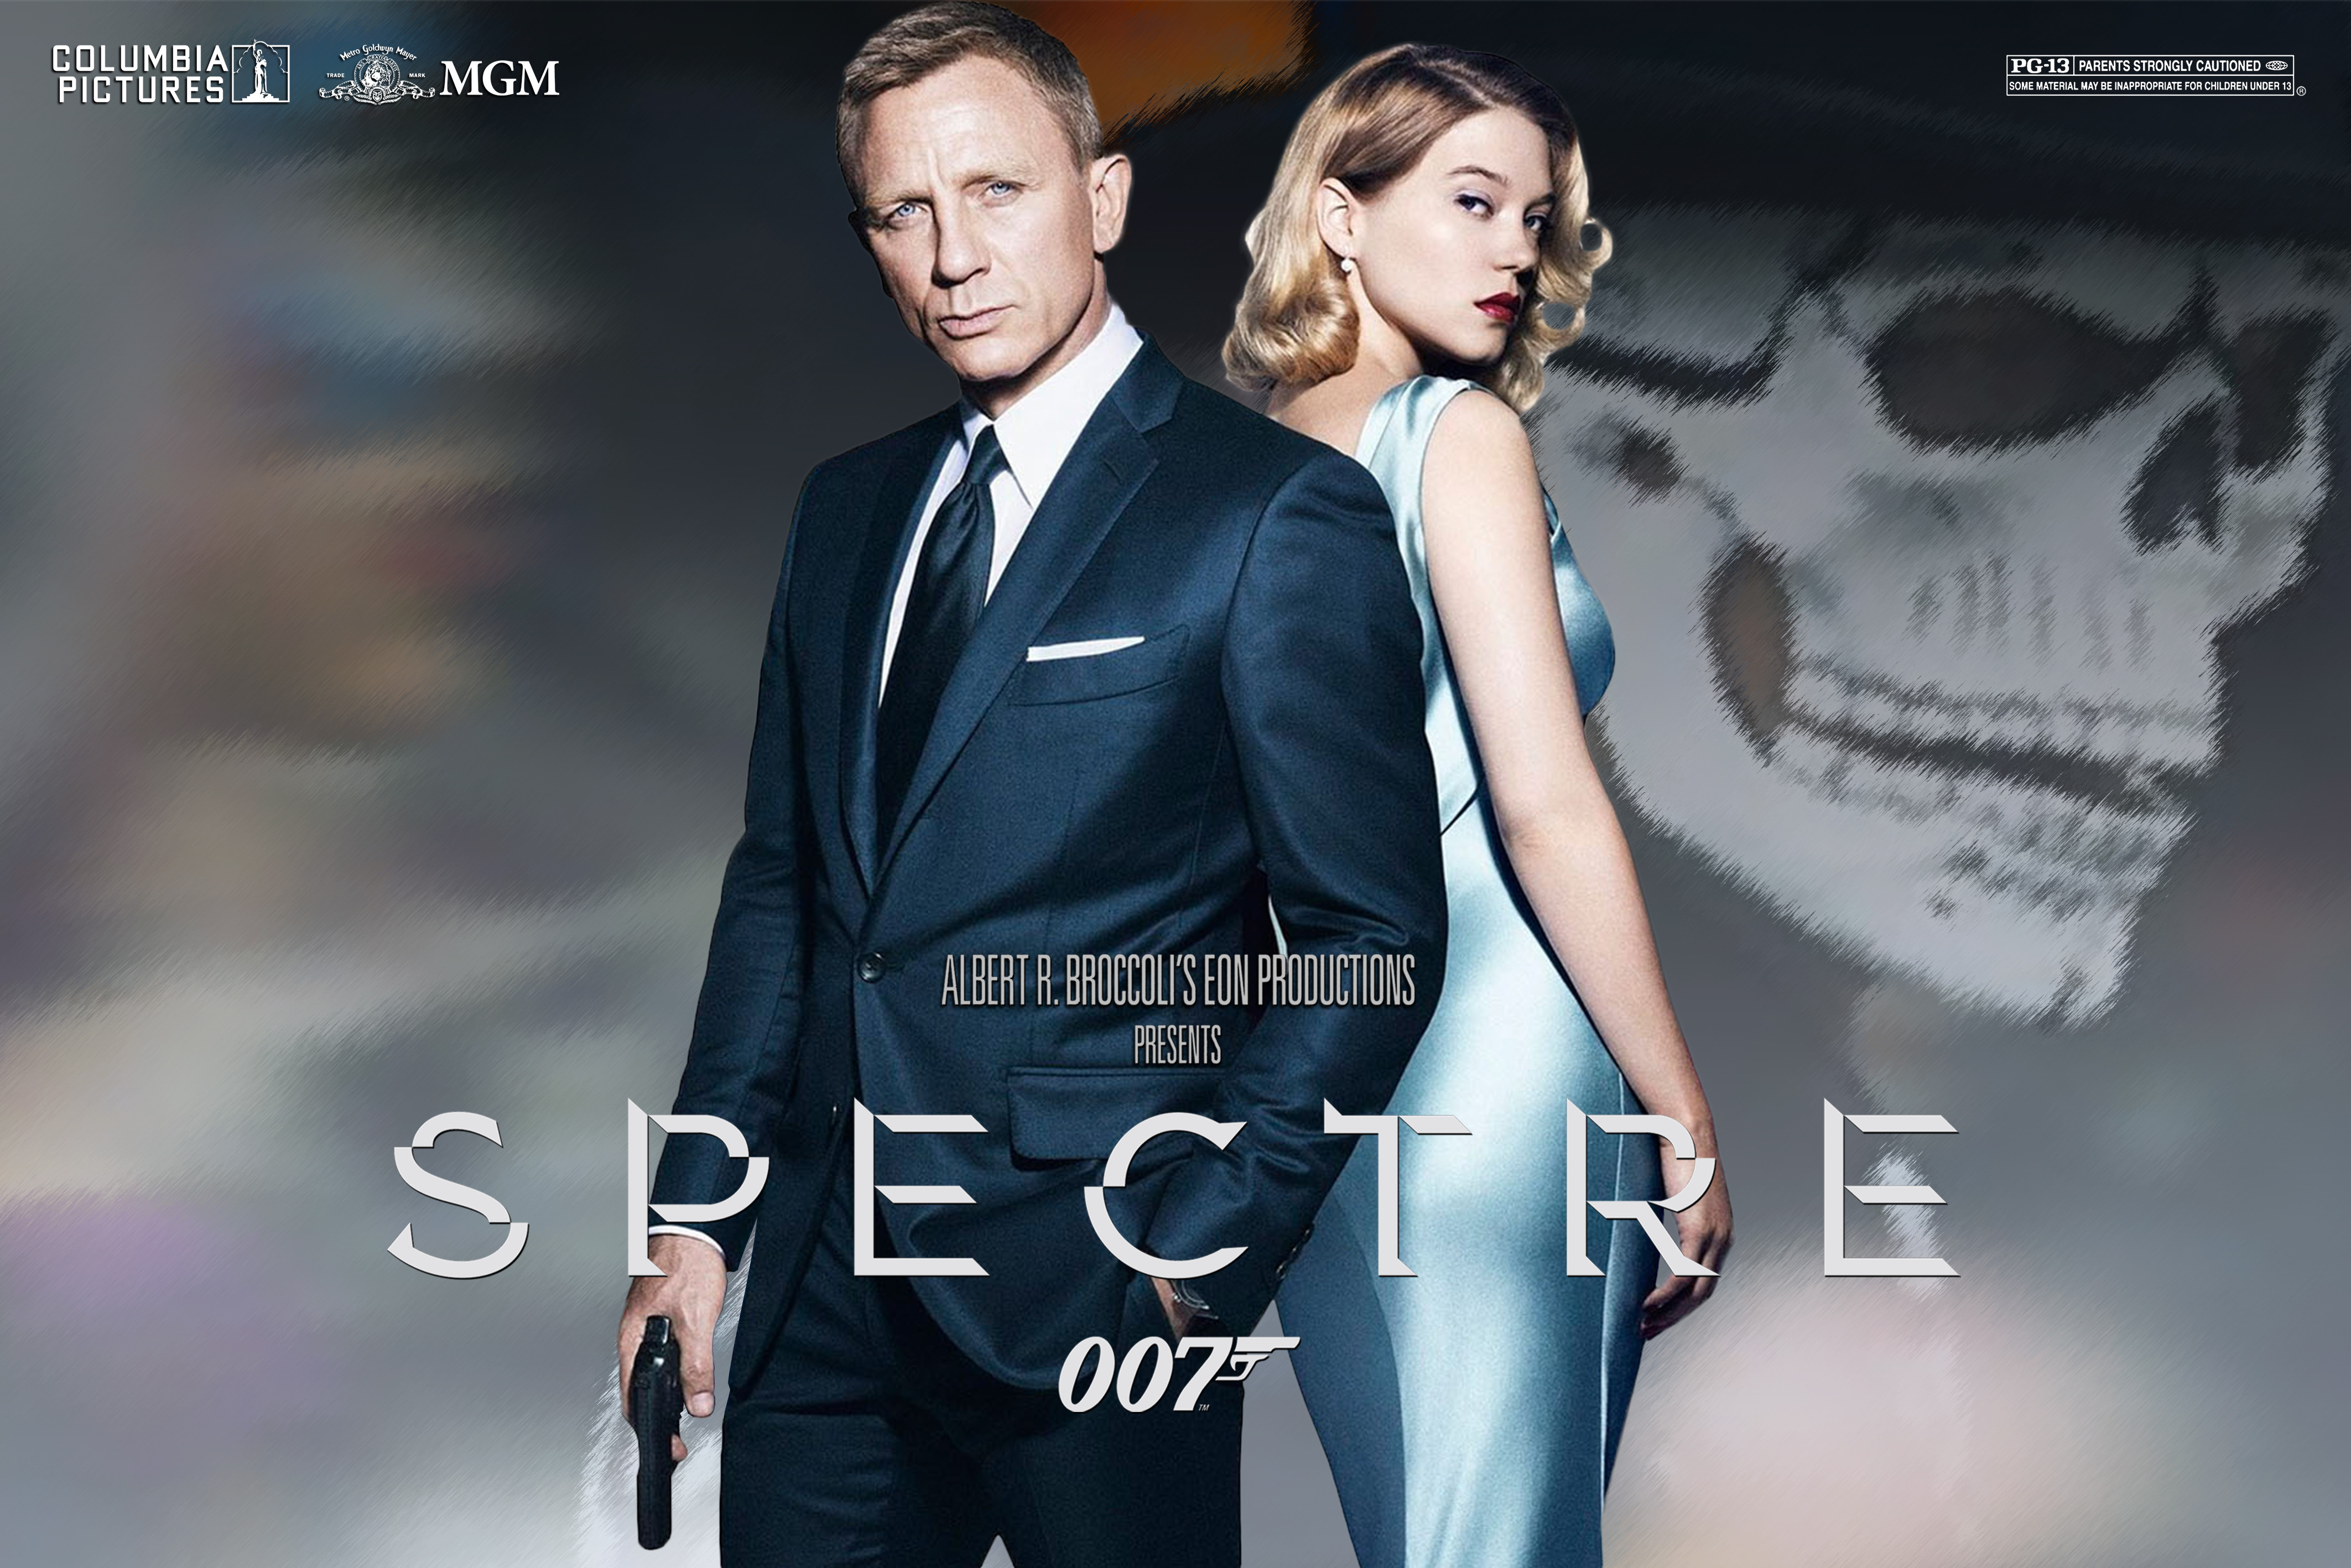 Films2me Spectre 2015 Blu Ray Torrent 1080p Fullhd